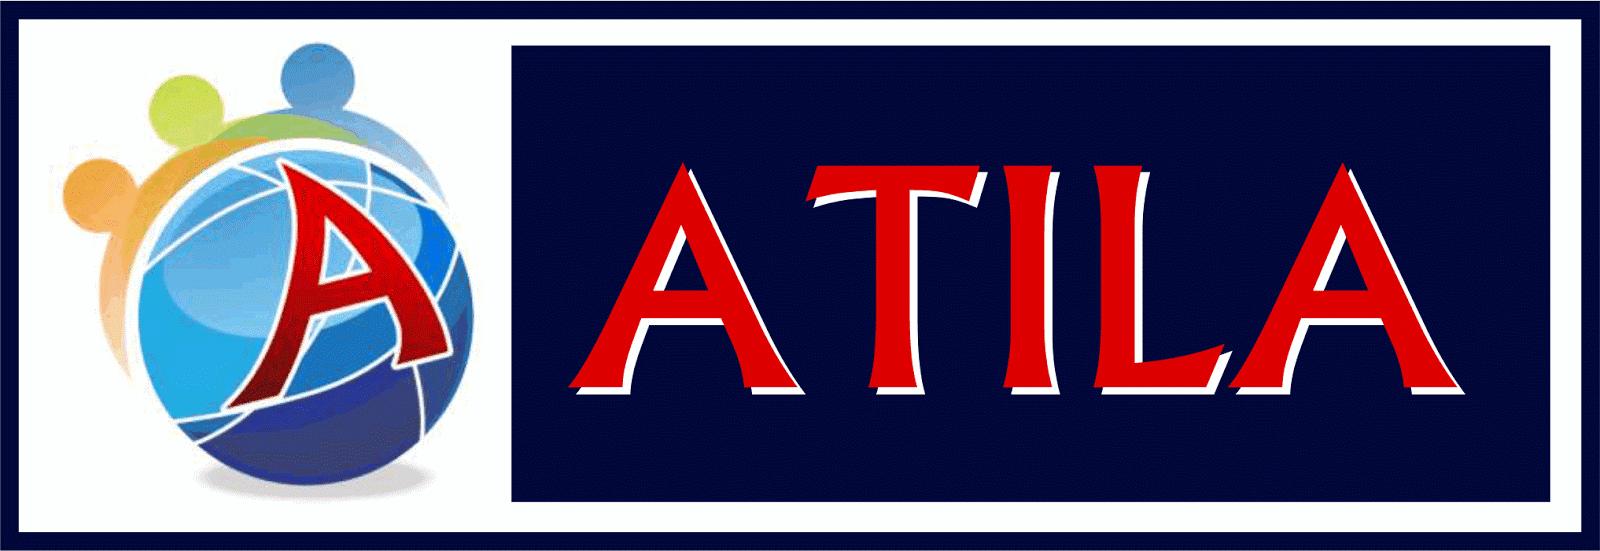 Aplicativo ATILA